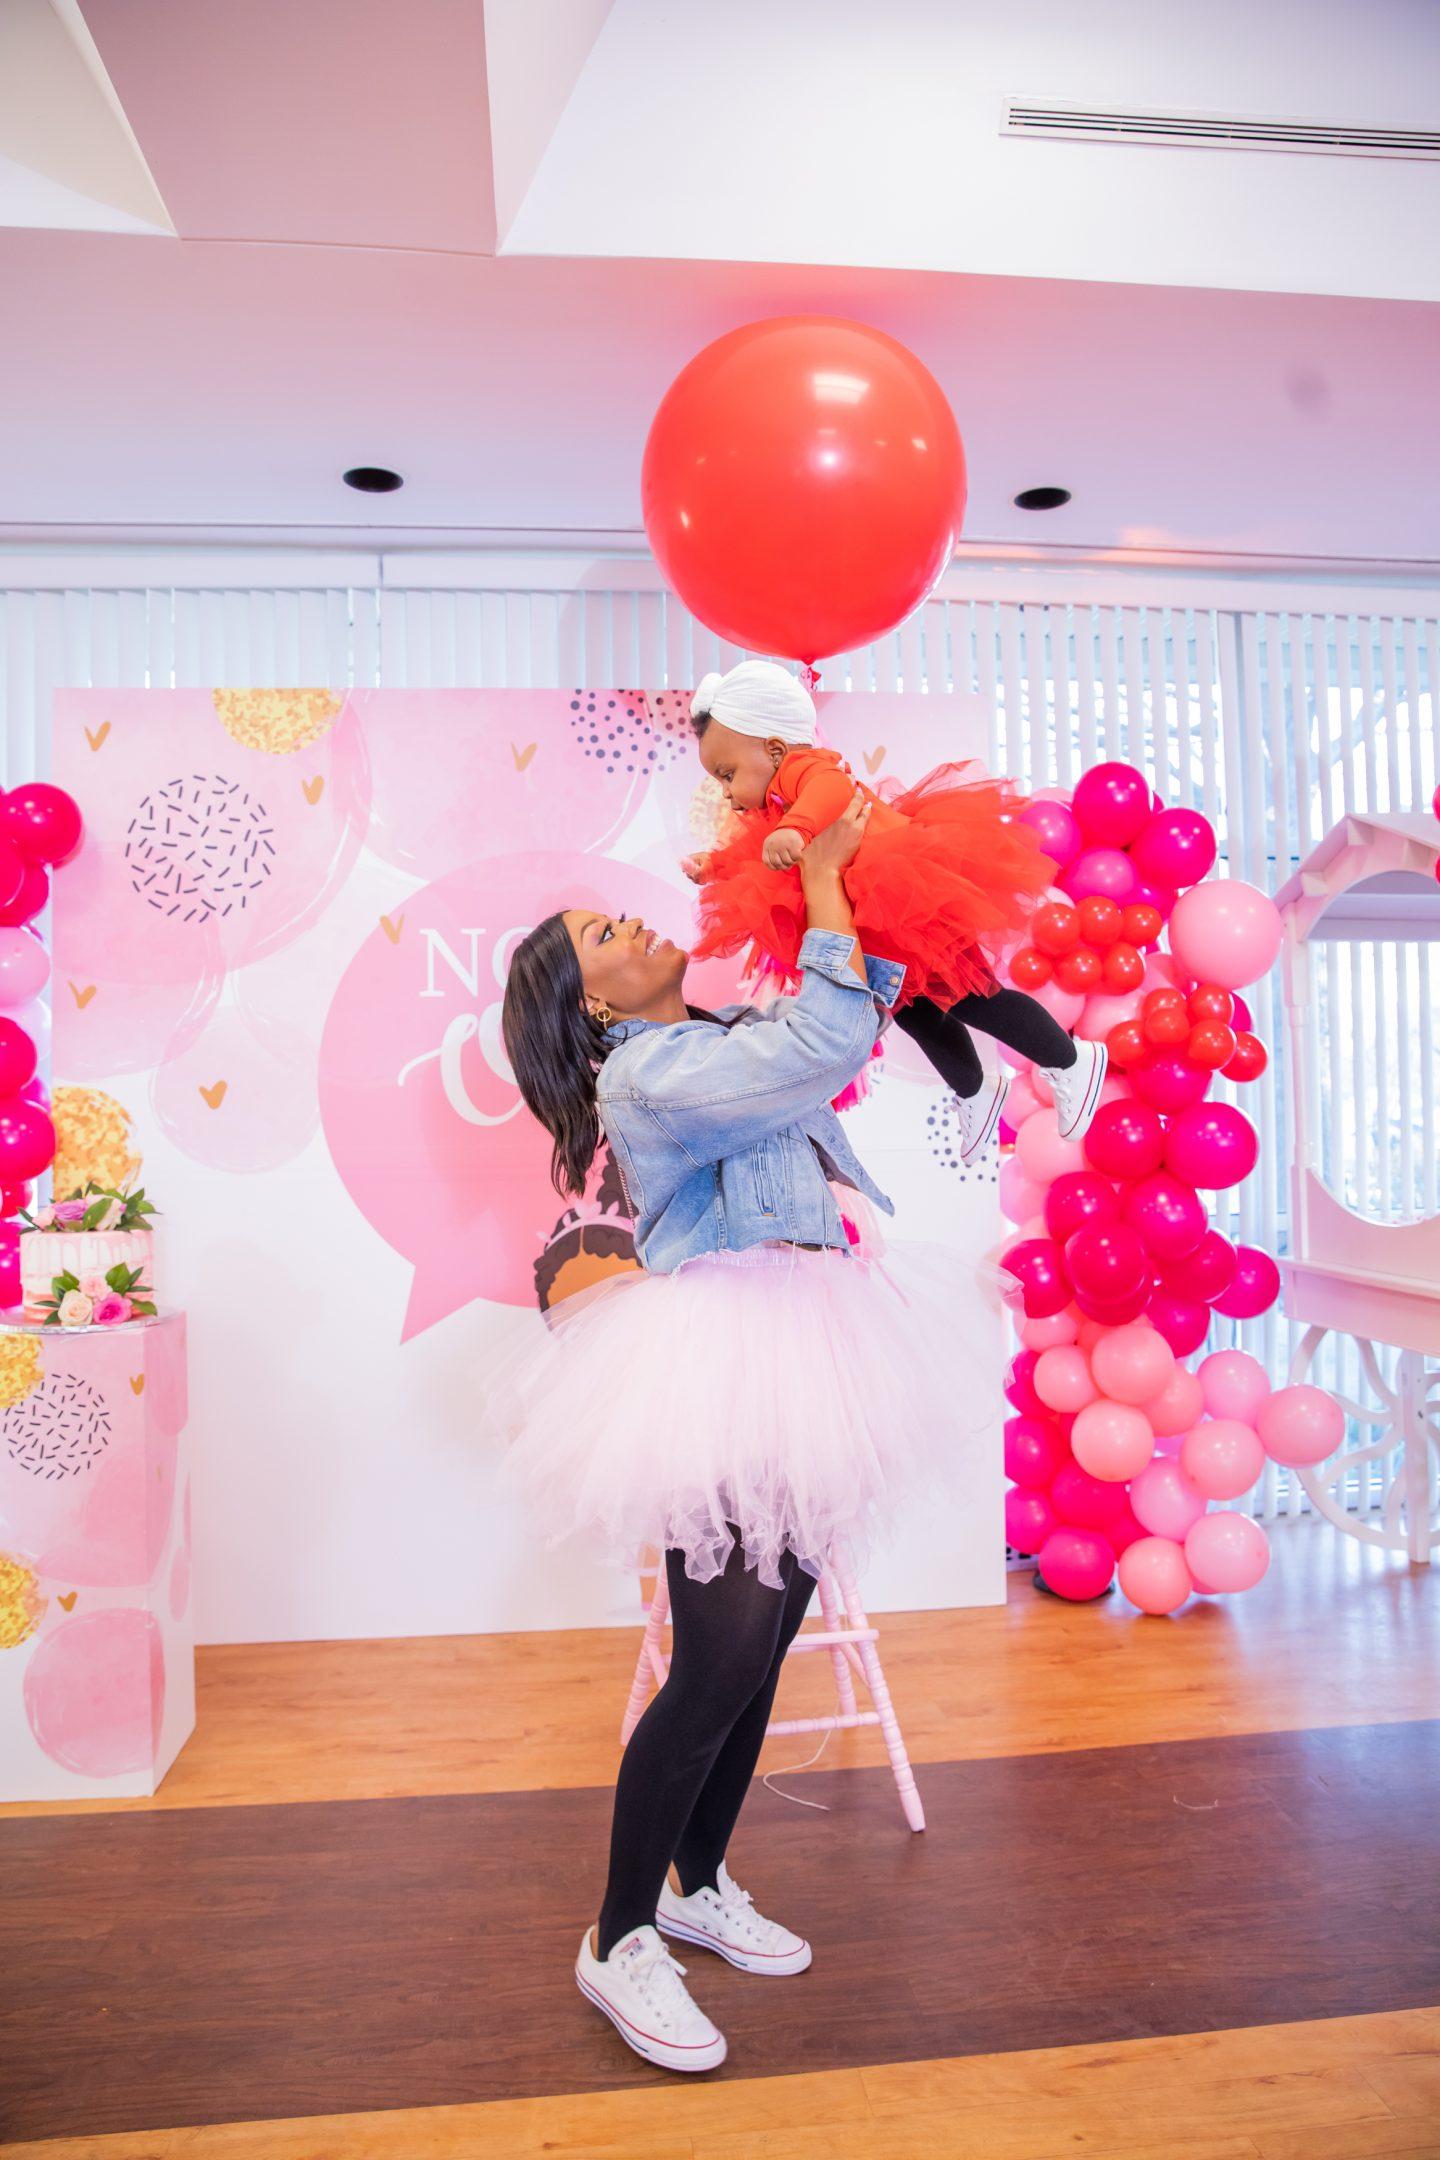 stella-adewunmi-of-jadore-fashion-blog-shares-valentines-day-birthday-ideas